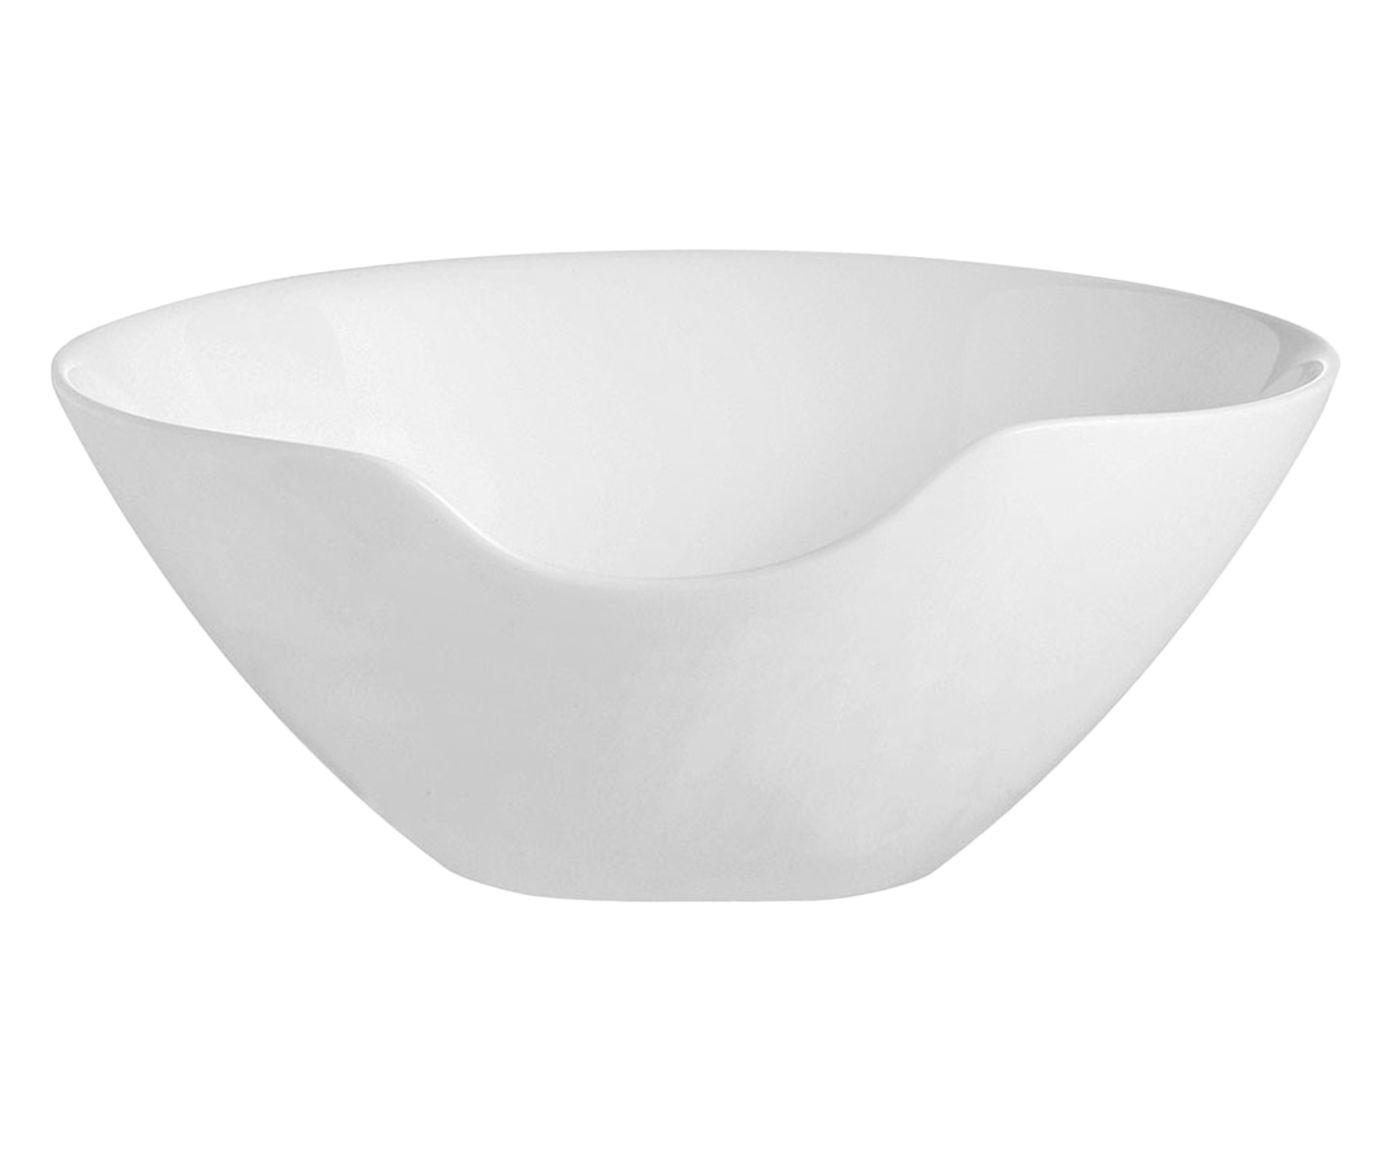 Bowl Salenco Branco - 16,6X7,1cm | Westwing.com.br